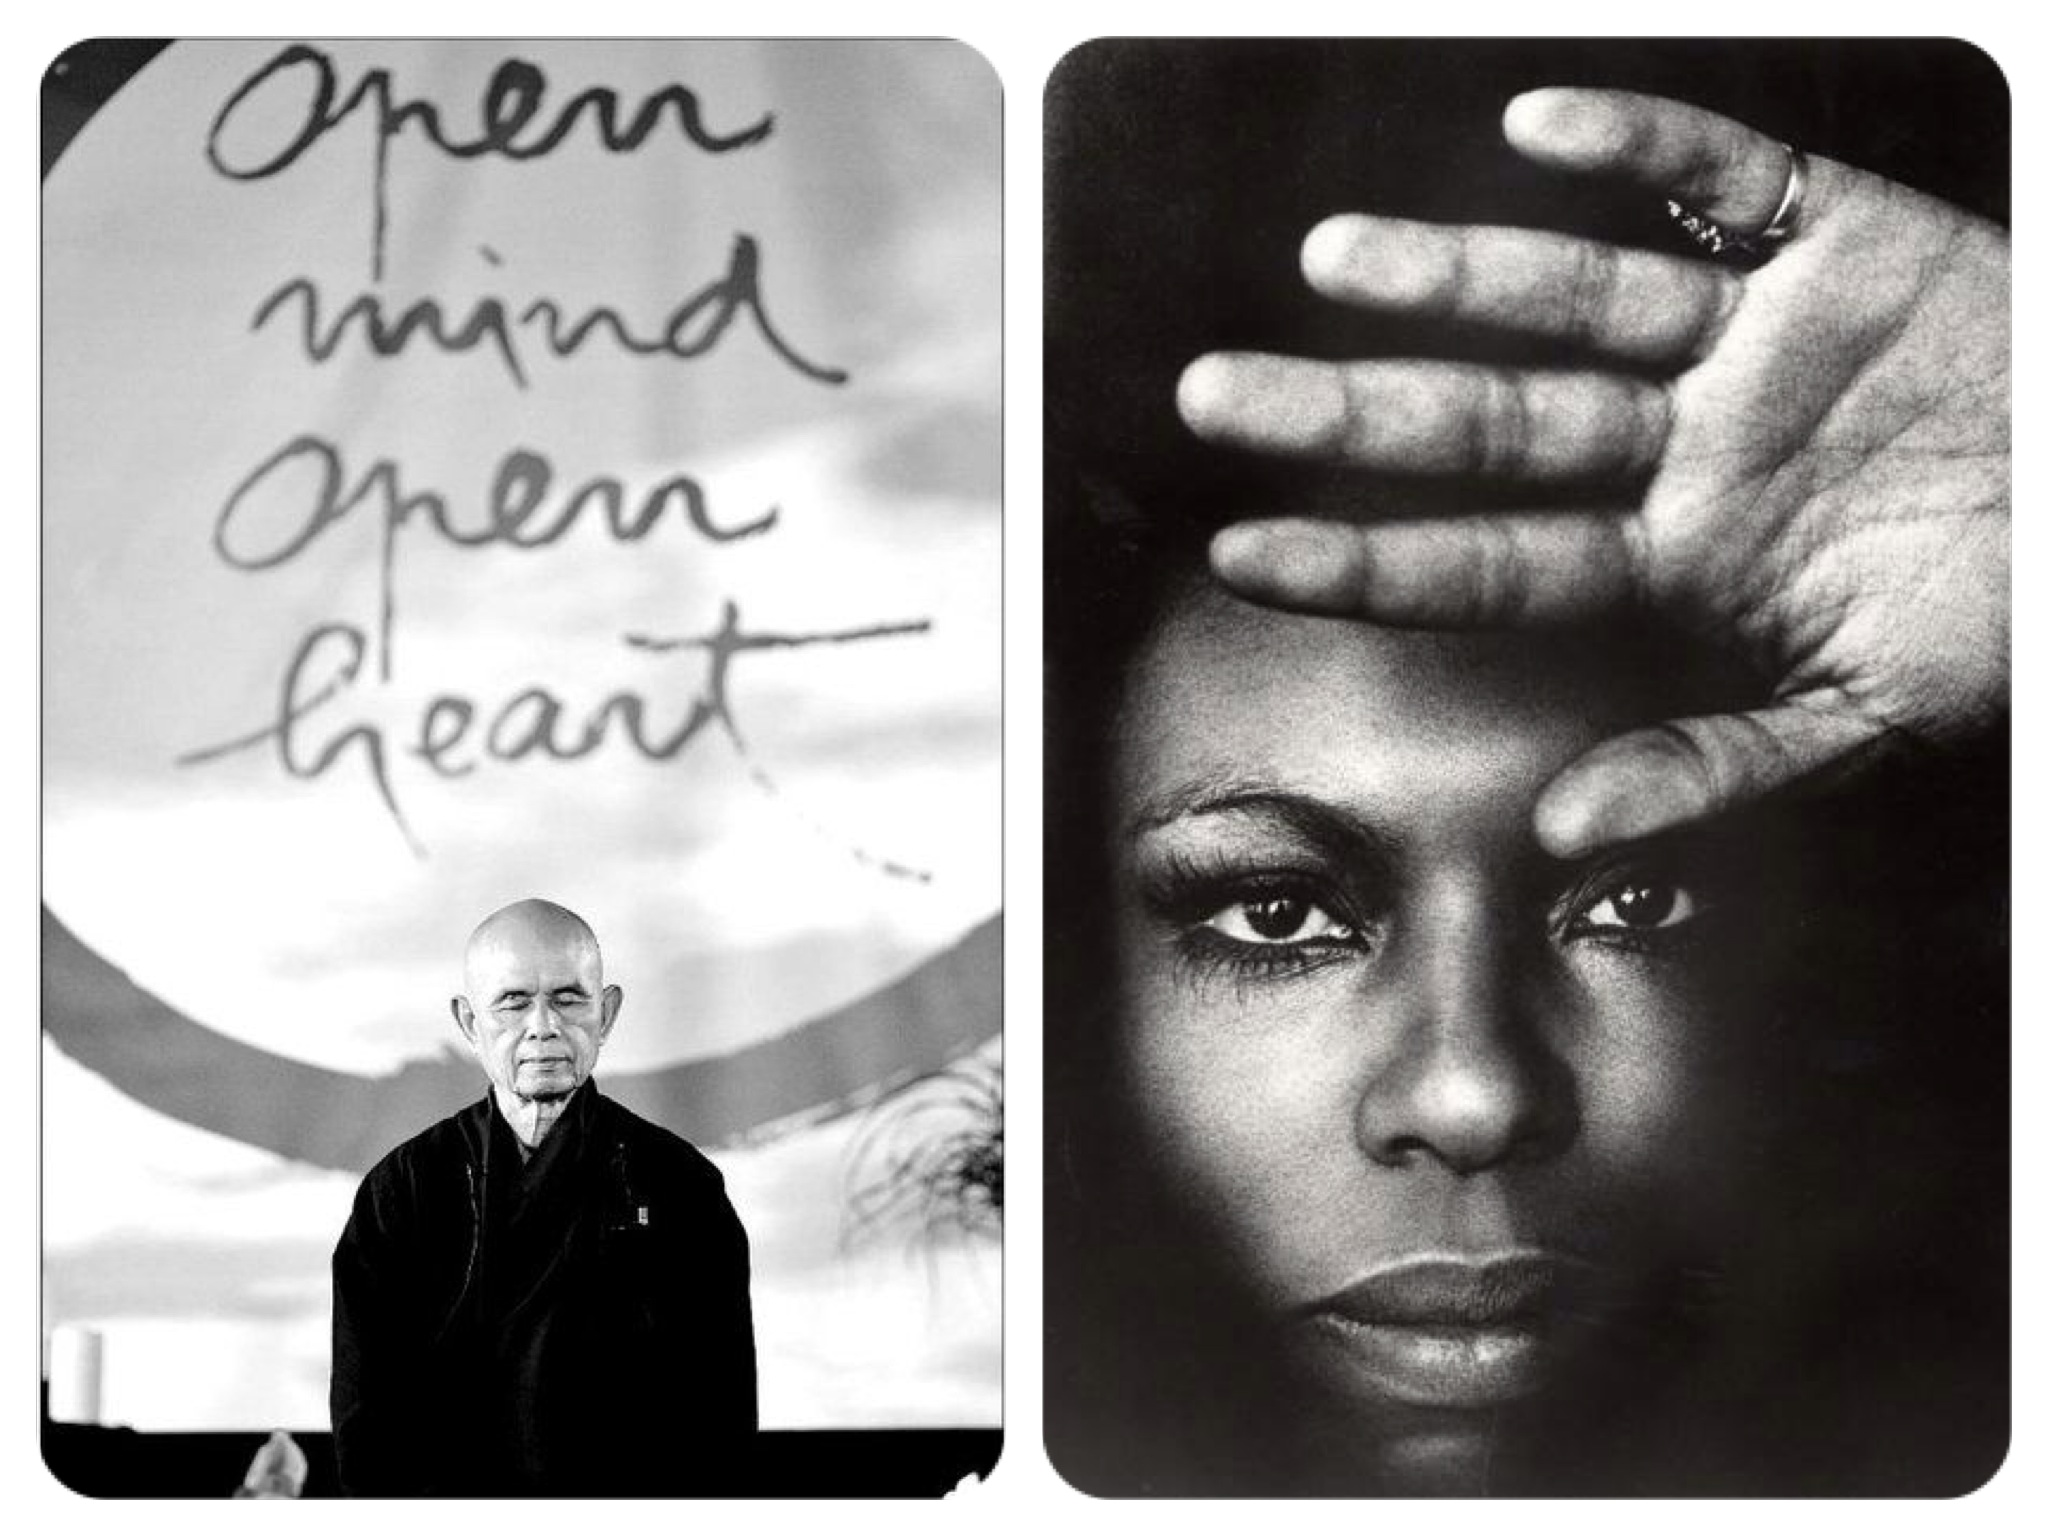 What's wrong with a little Zen and R&B? Zen Master Thich Nhat Hann & Soul Songstress Roberta Flack - a rare combo